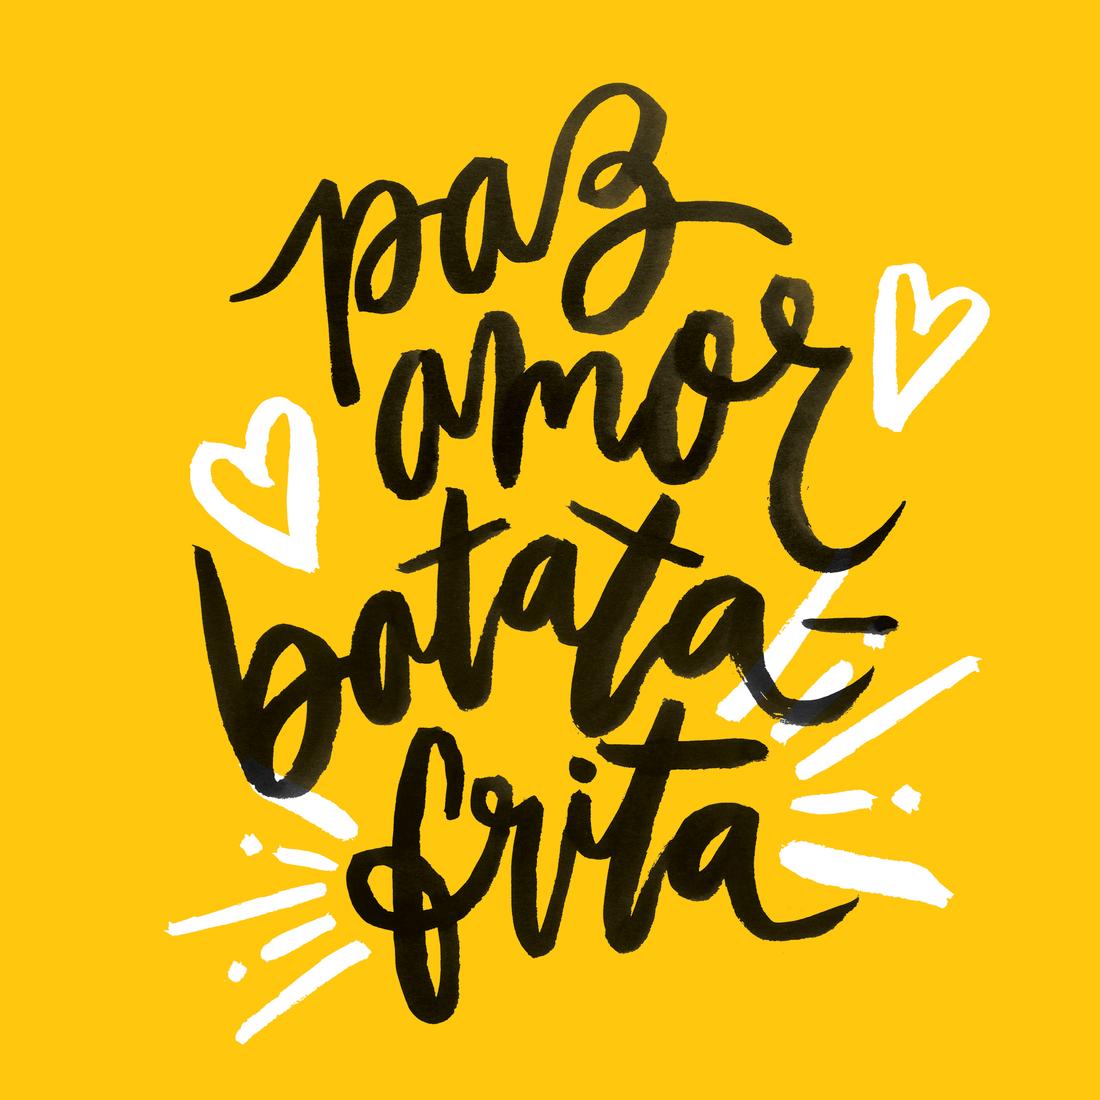 Paz Amor Batata Frita Prints Coisas Para Usar Pinterest  ~ Frases De Limpeza Na Cozinha